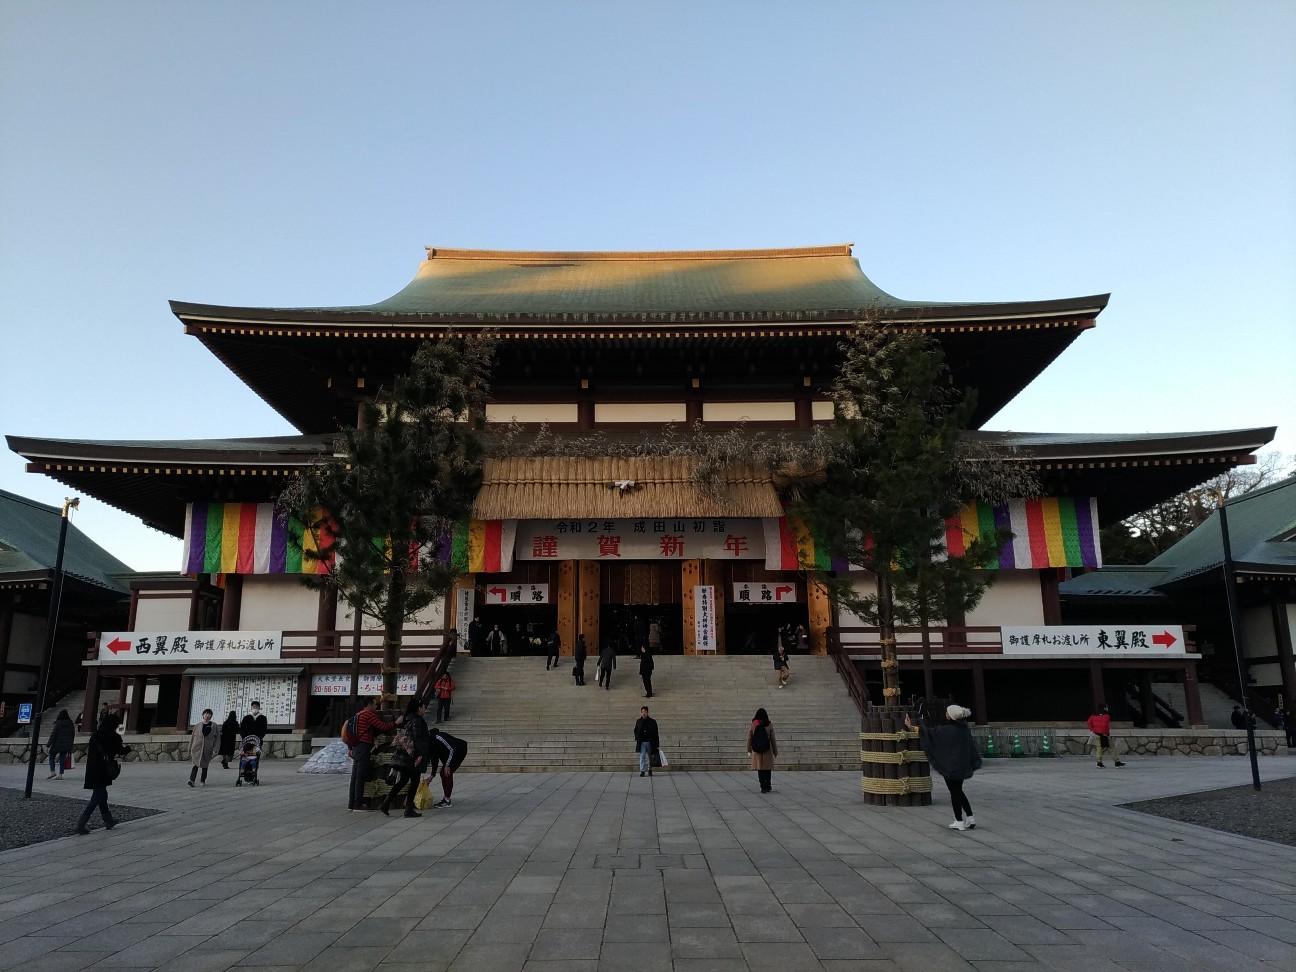 f:id:HKT1989:20200110132037j:image